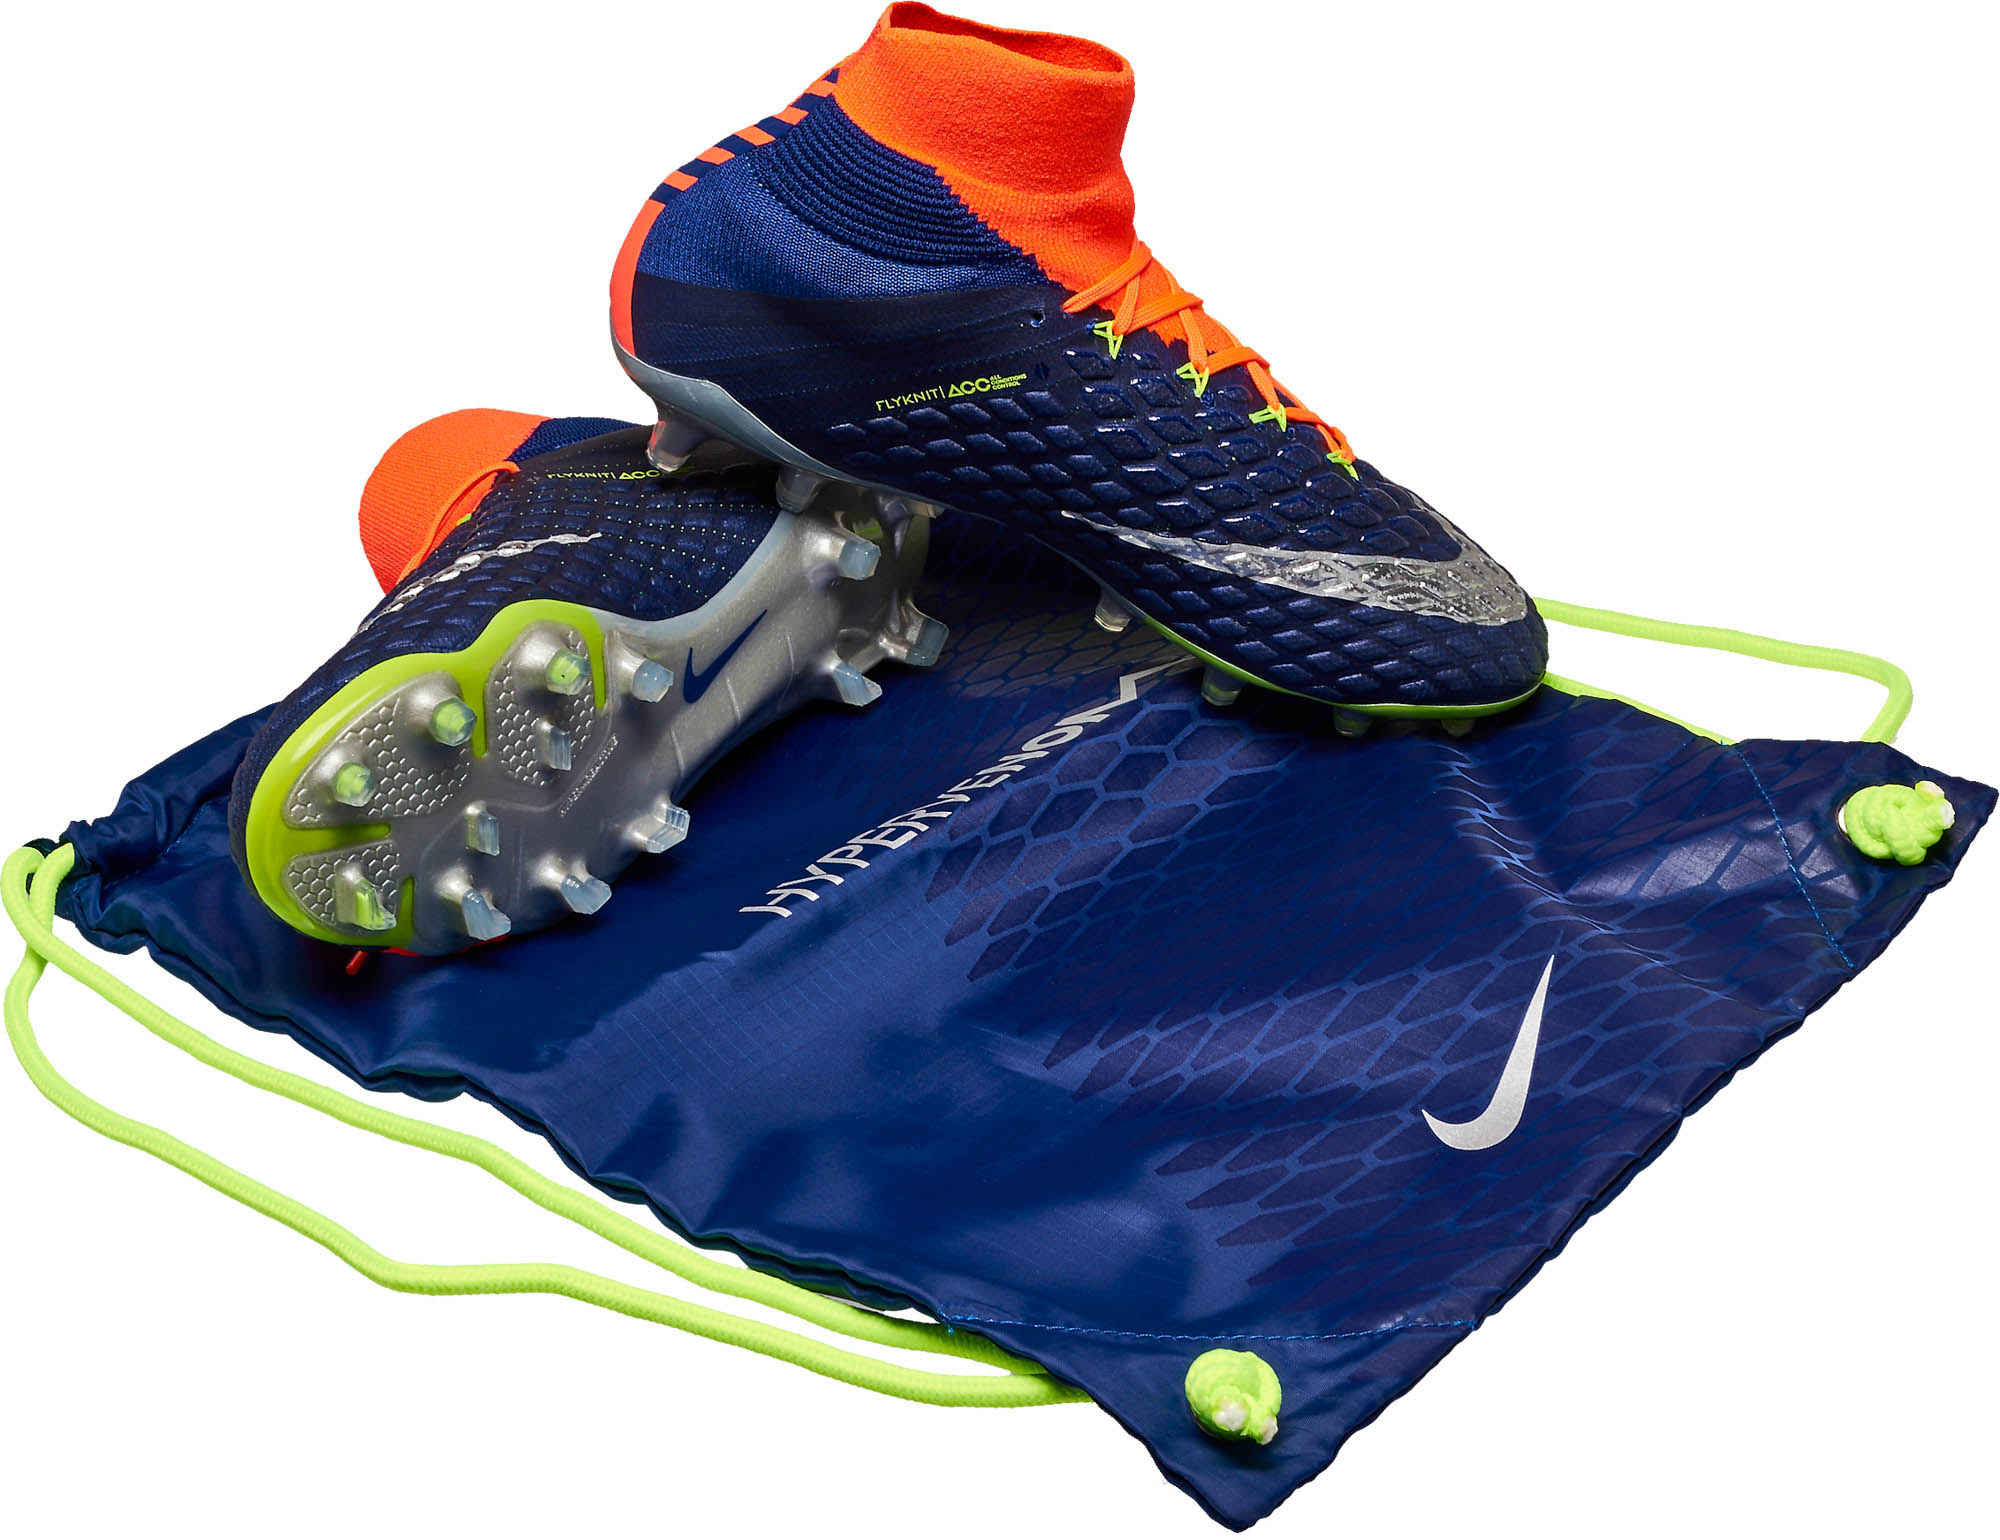 newest 02a93 2a211 Nike Hypervenom Phantom III DF FG – Deep Royal Chrome